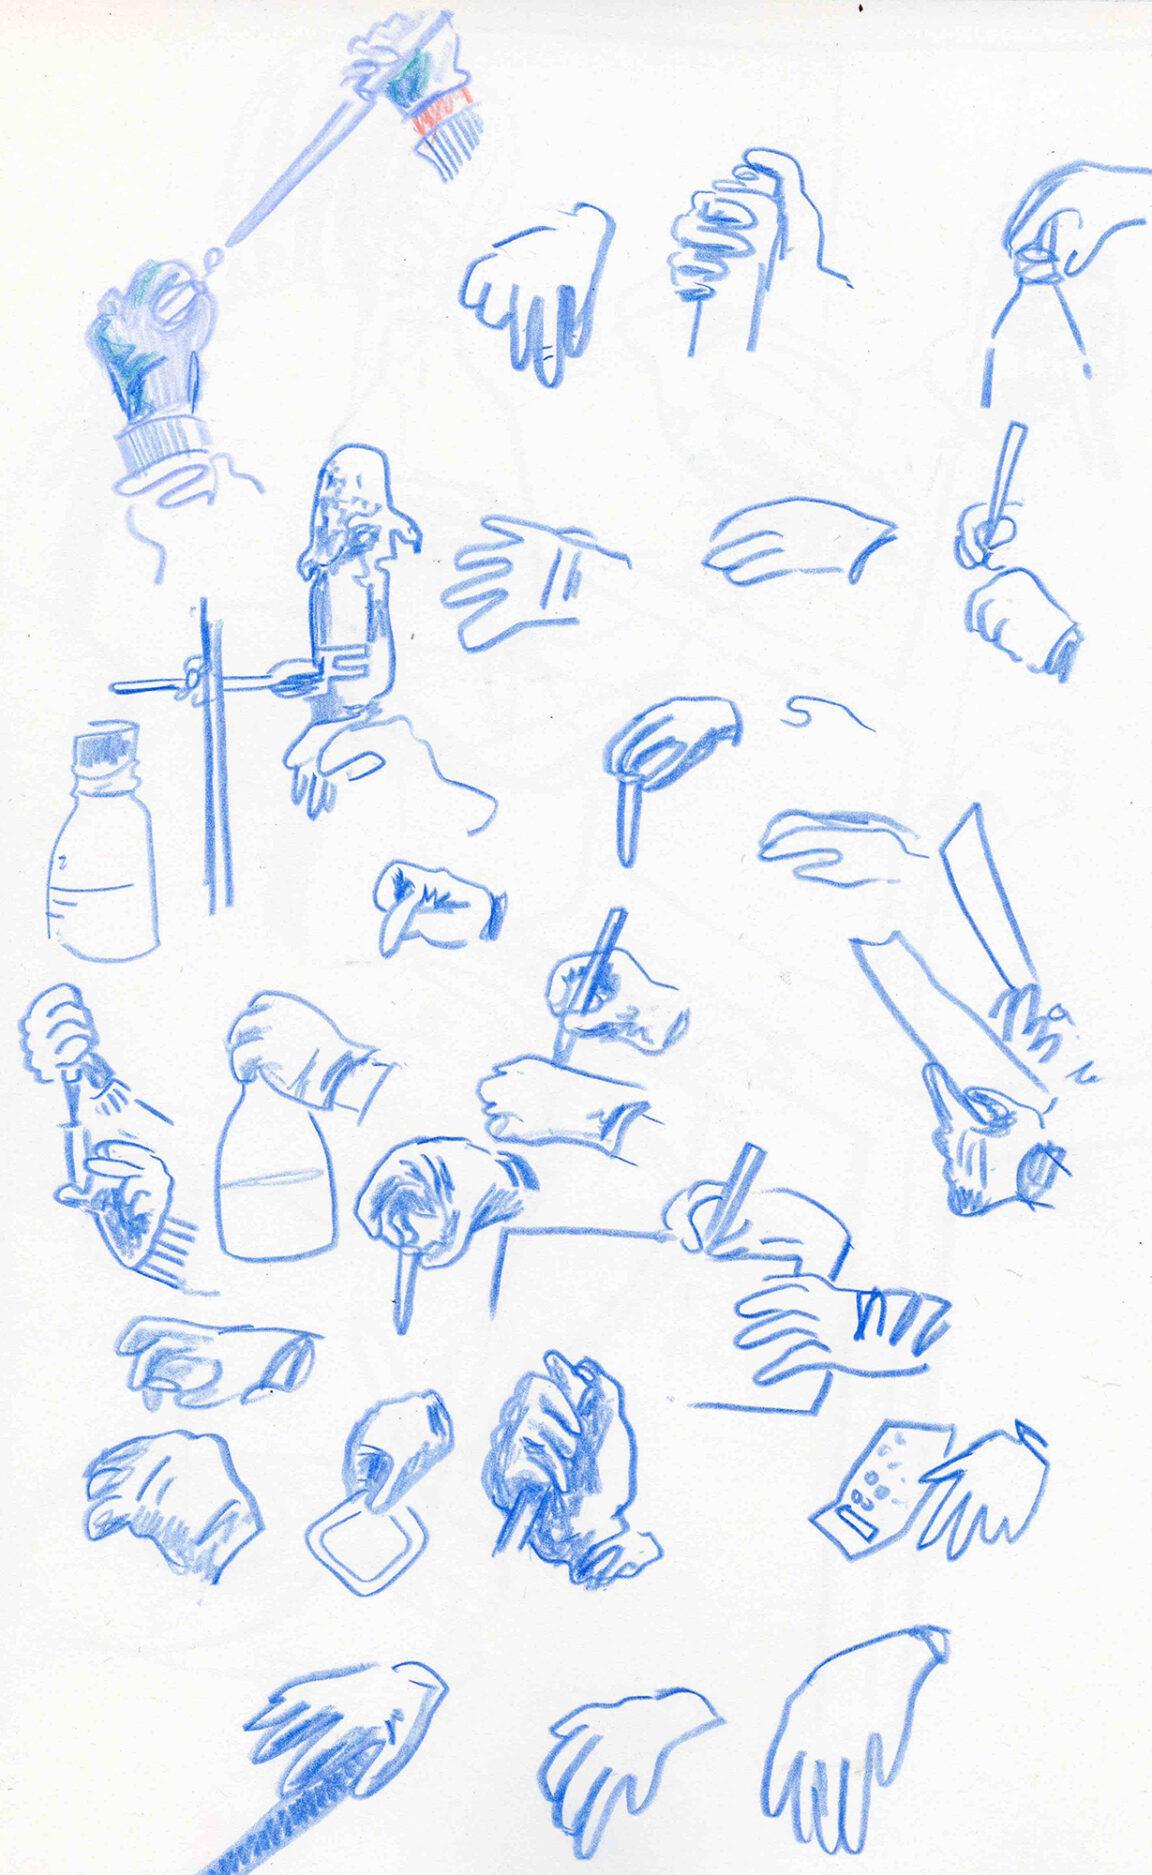 Observational sketches of hands doing lab work